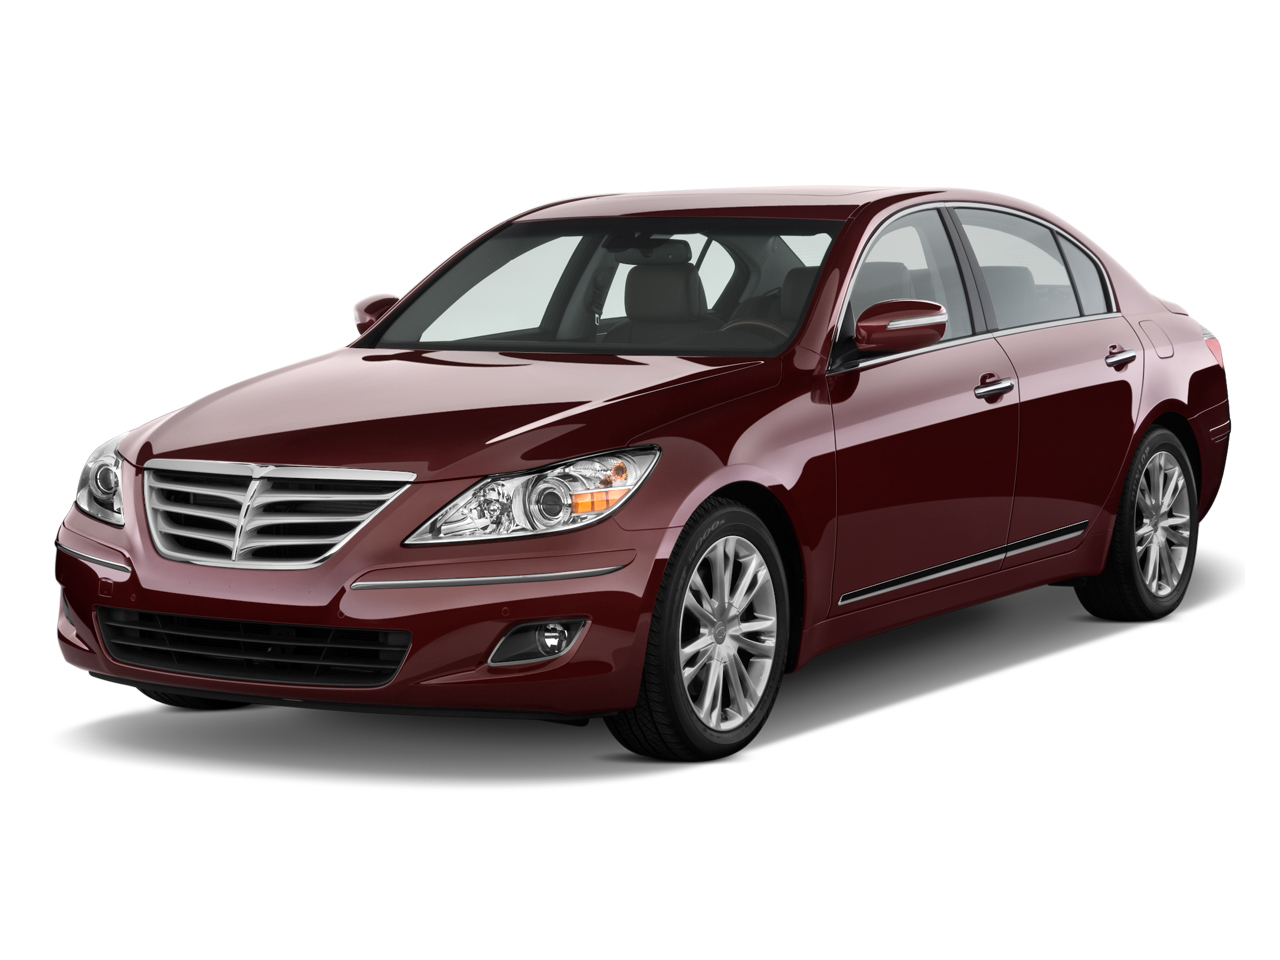 2011 Hyundai Genesis Gas Mileage The Car Connection